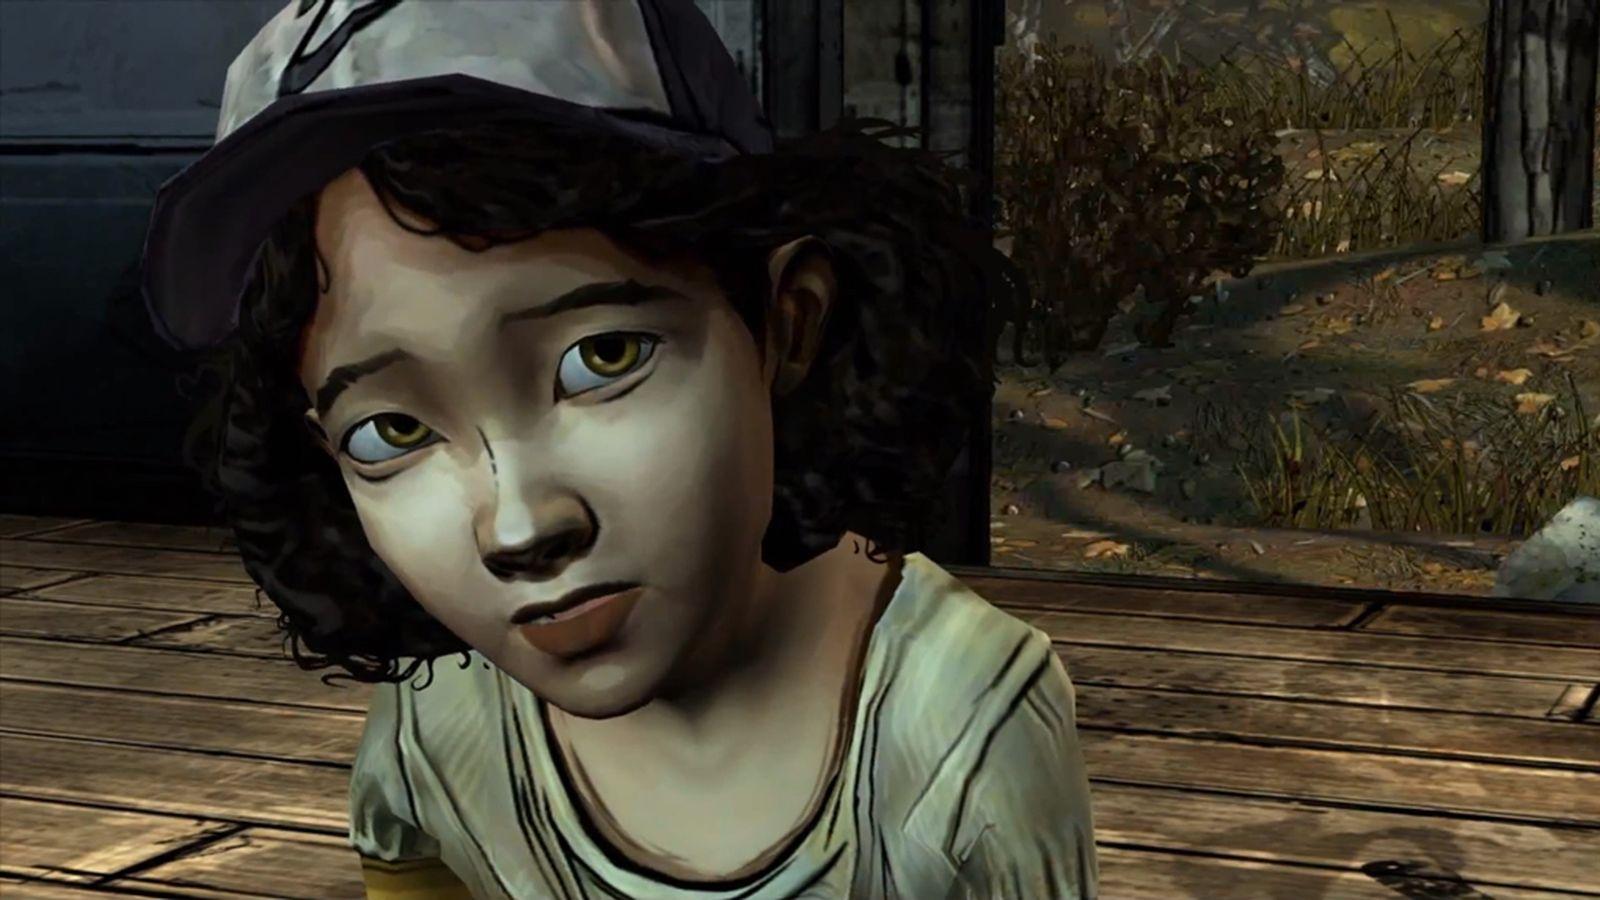 personagens femininas nos games – clementine the walking dead 2